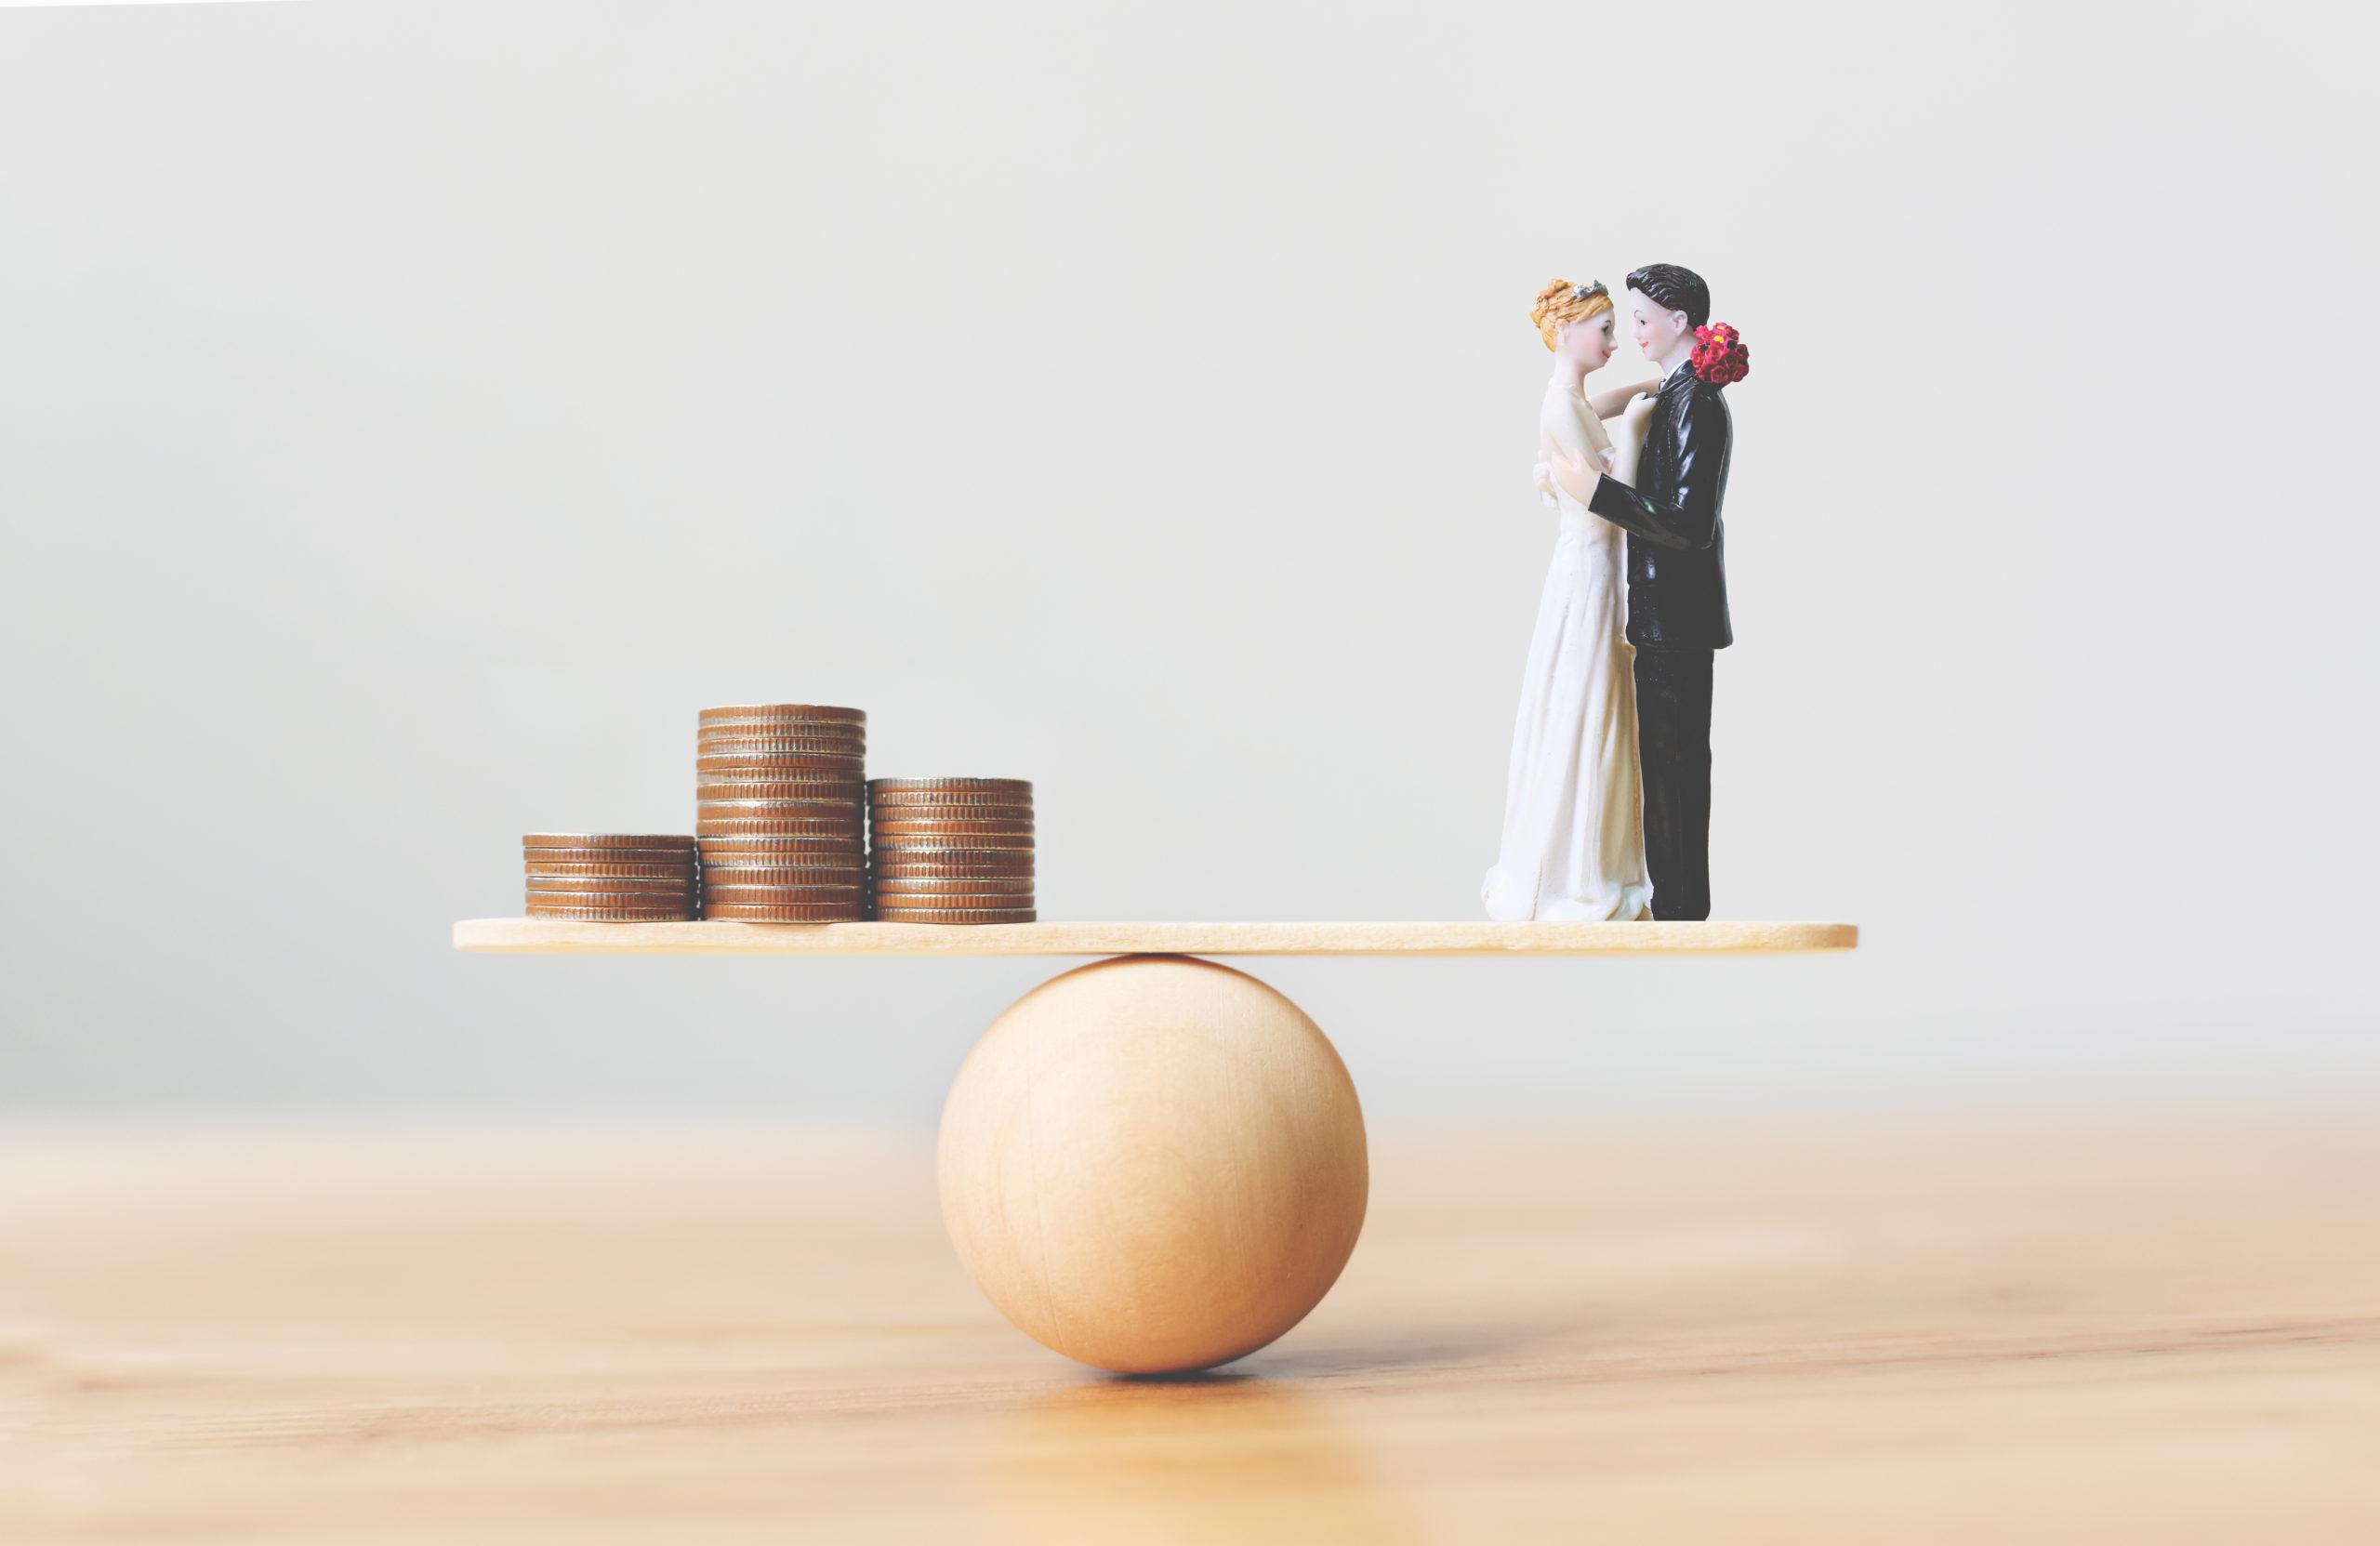 financial-save-money-wedding-prepare-marriage-1458854444